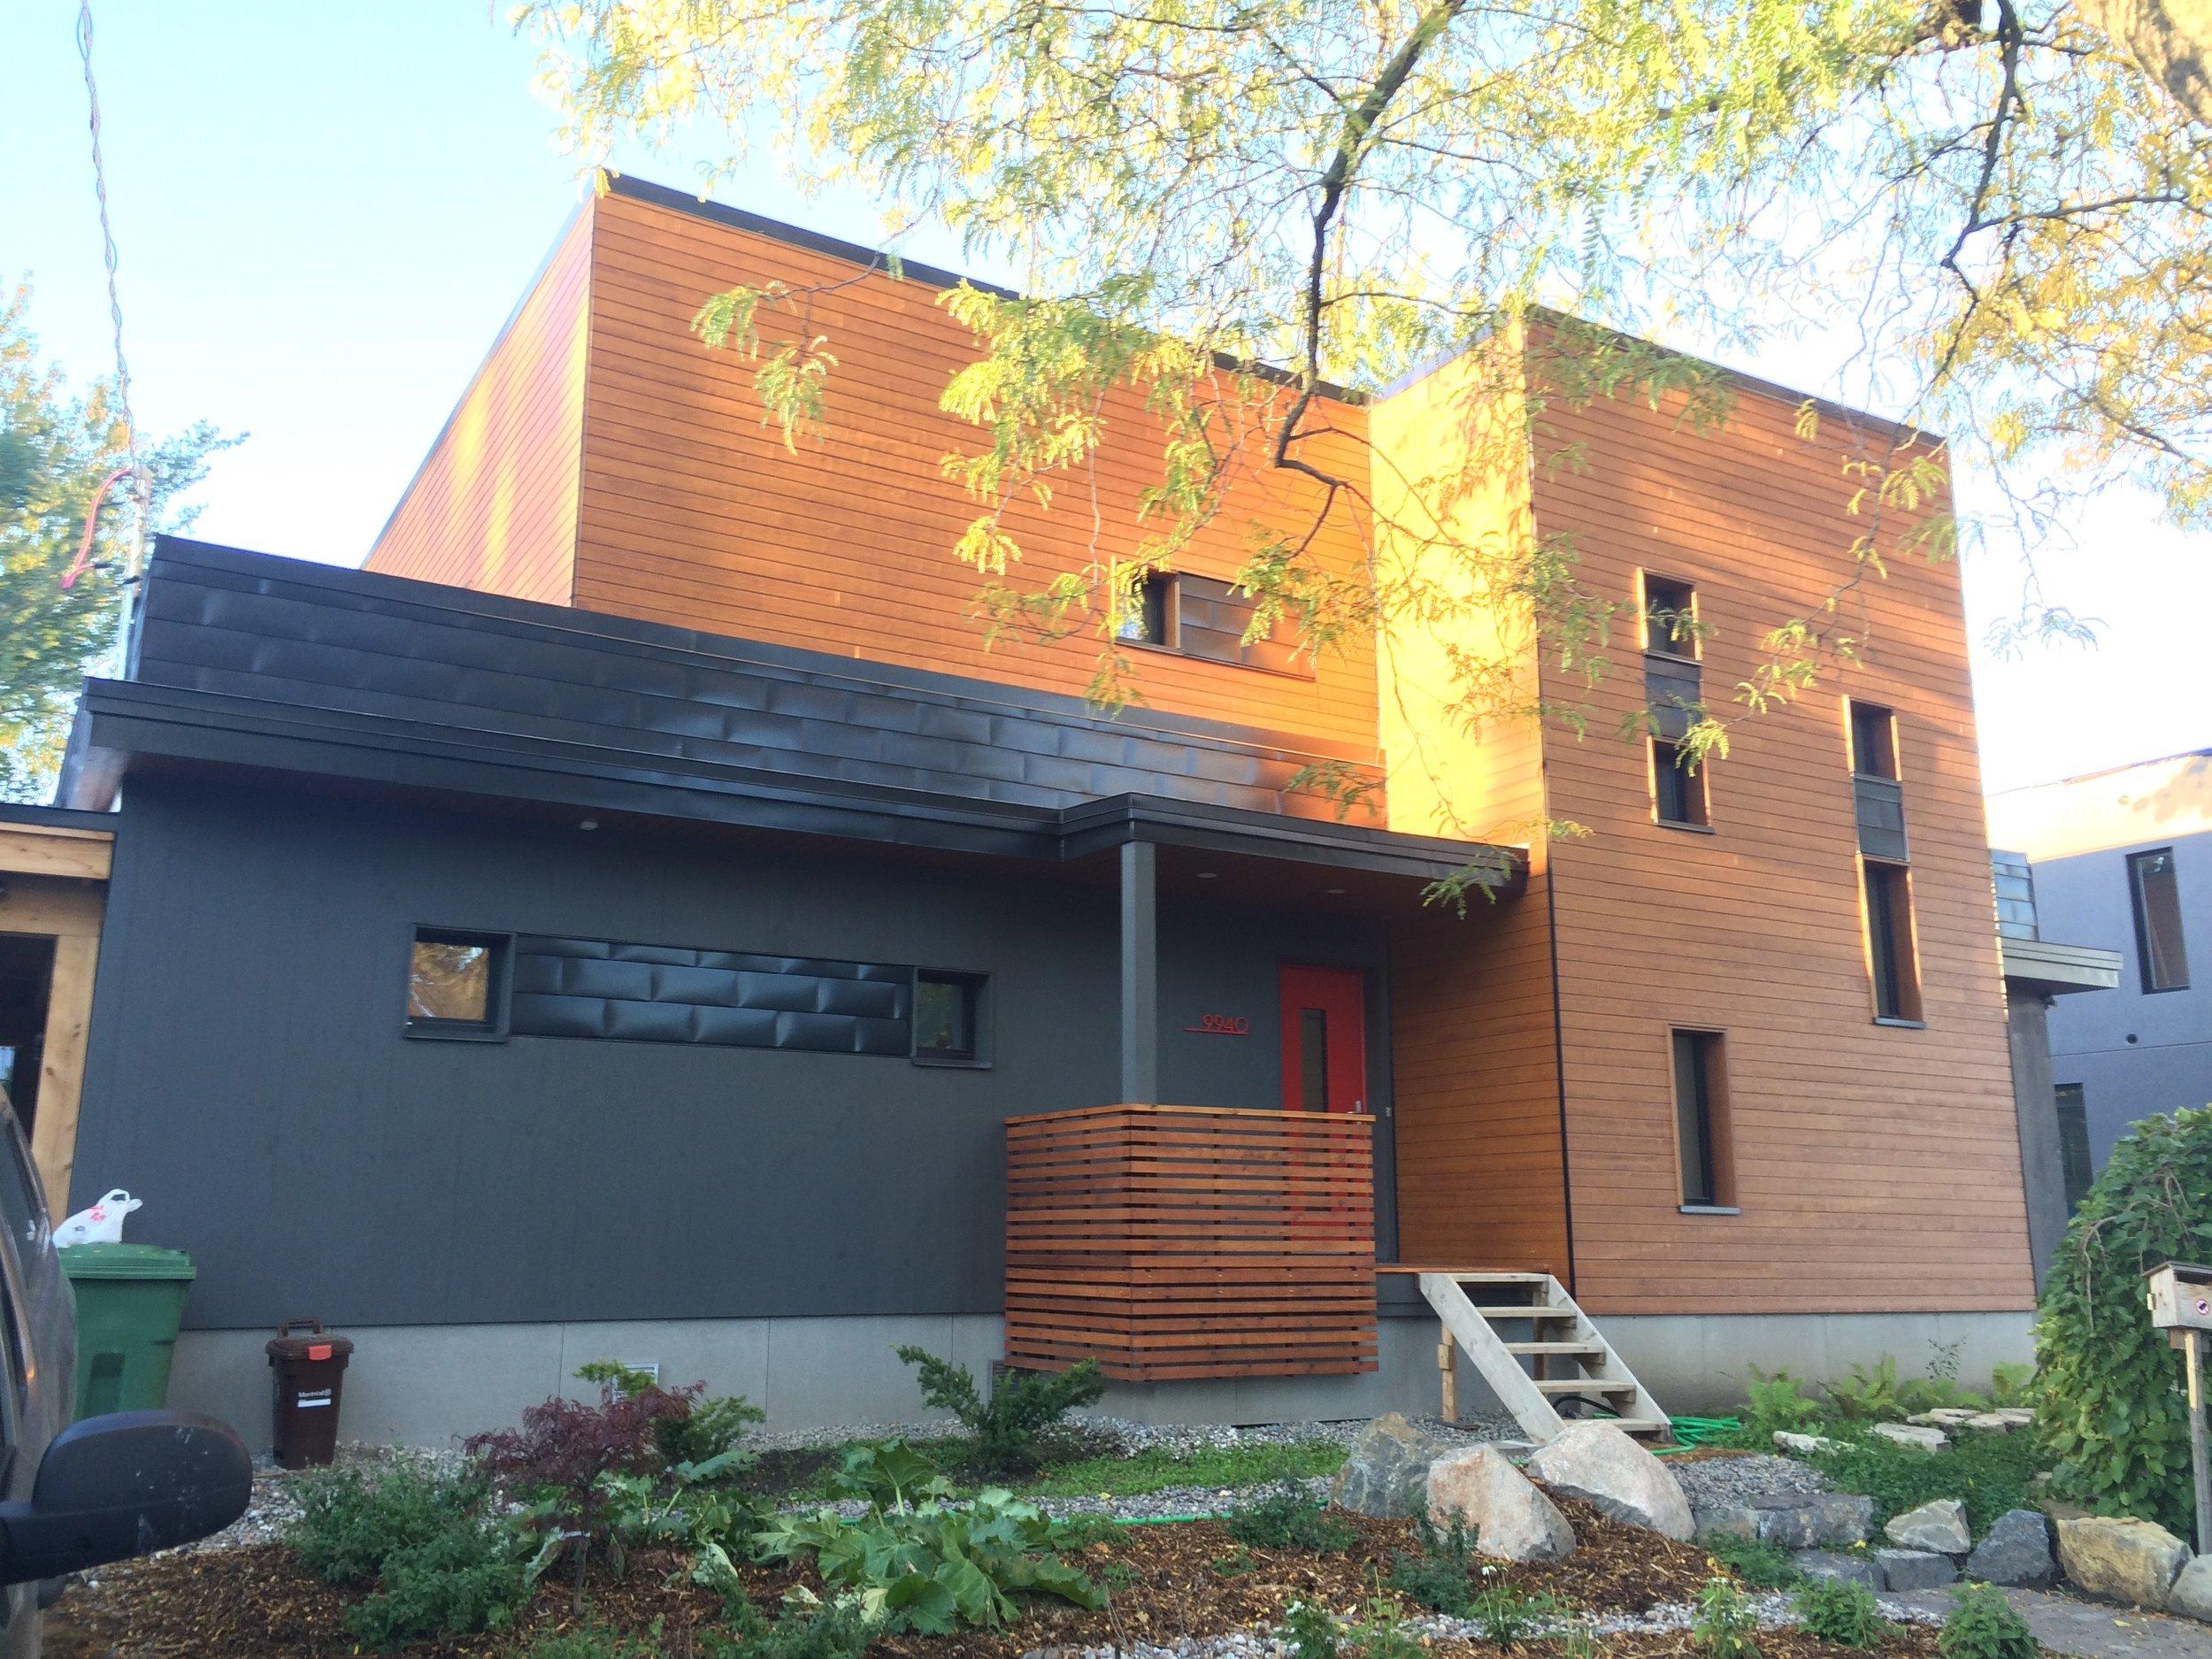 Maison Ozalee, Montreal QC 2016